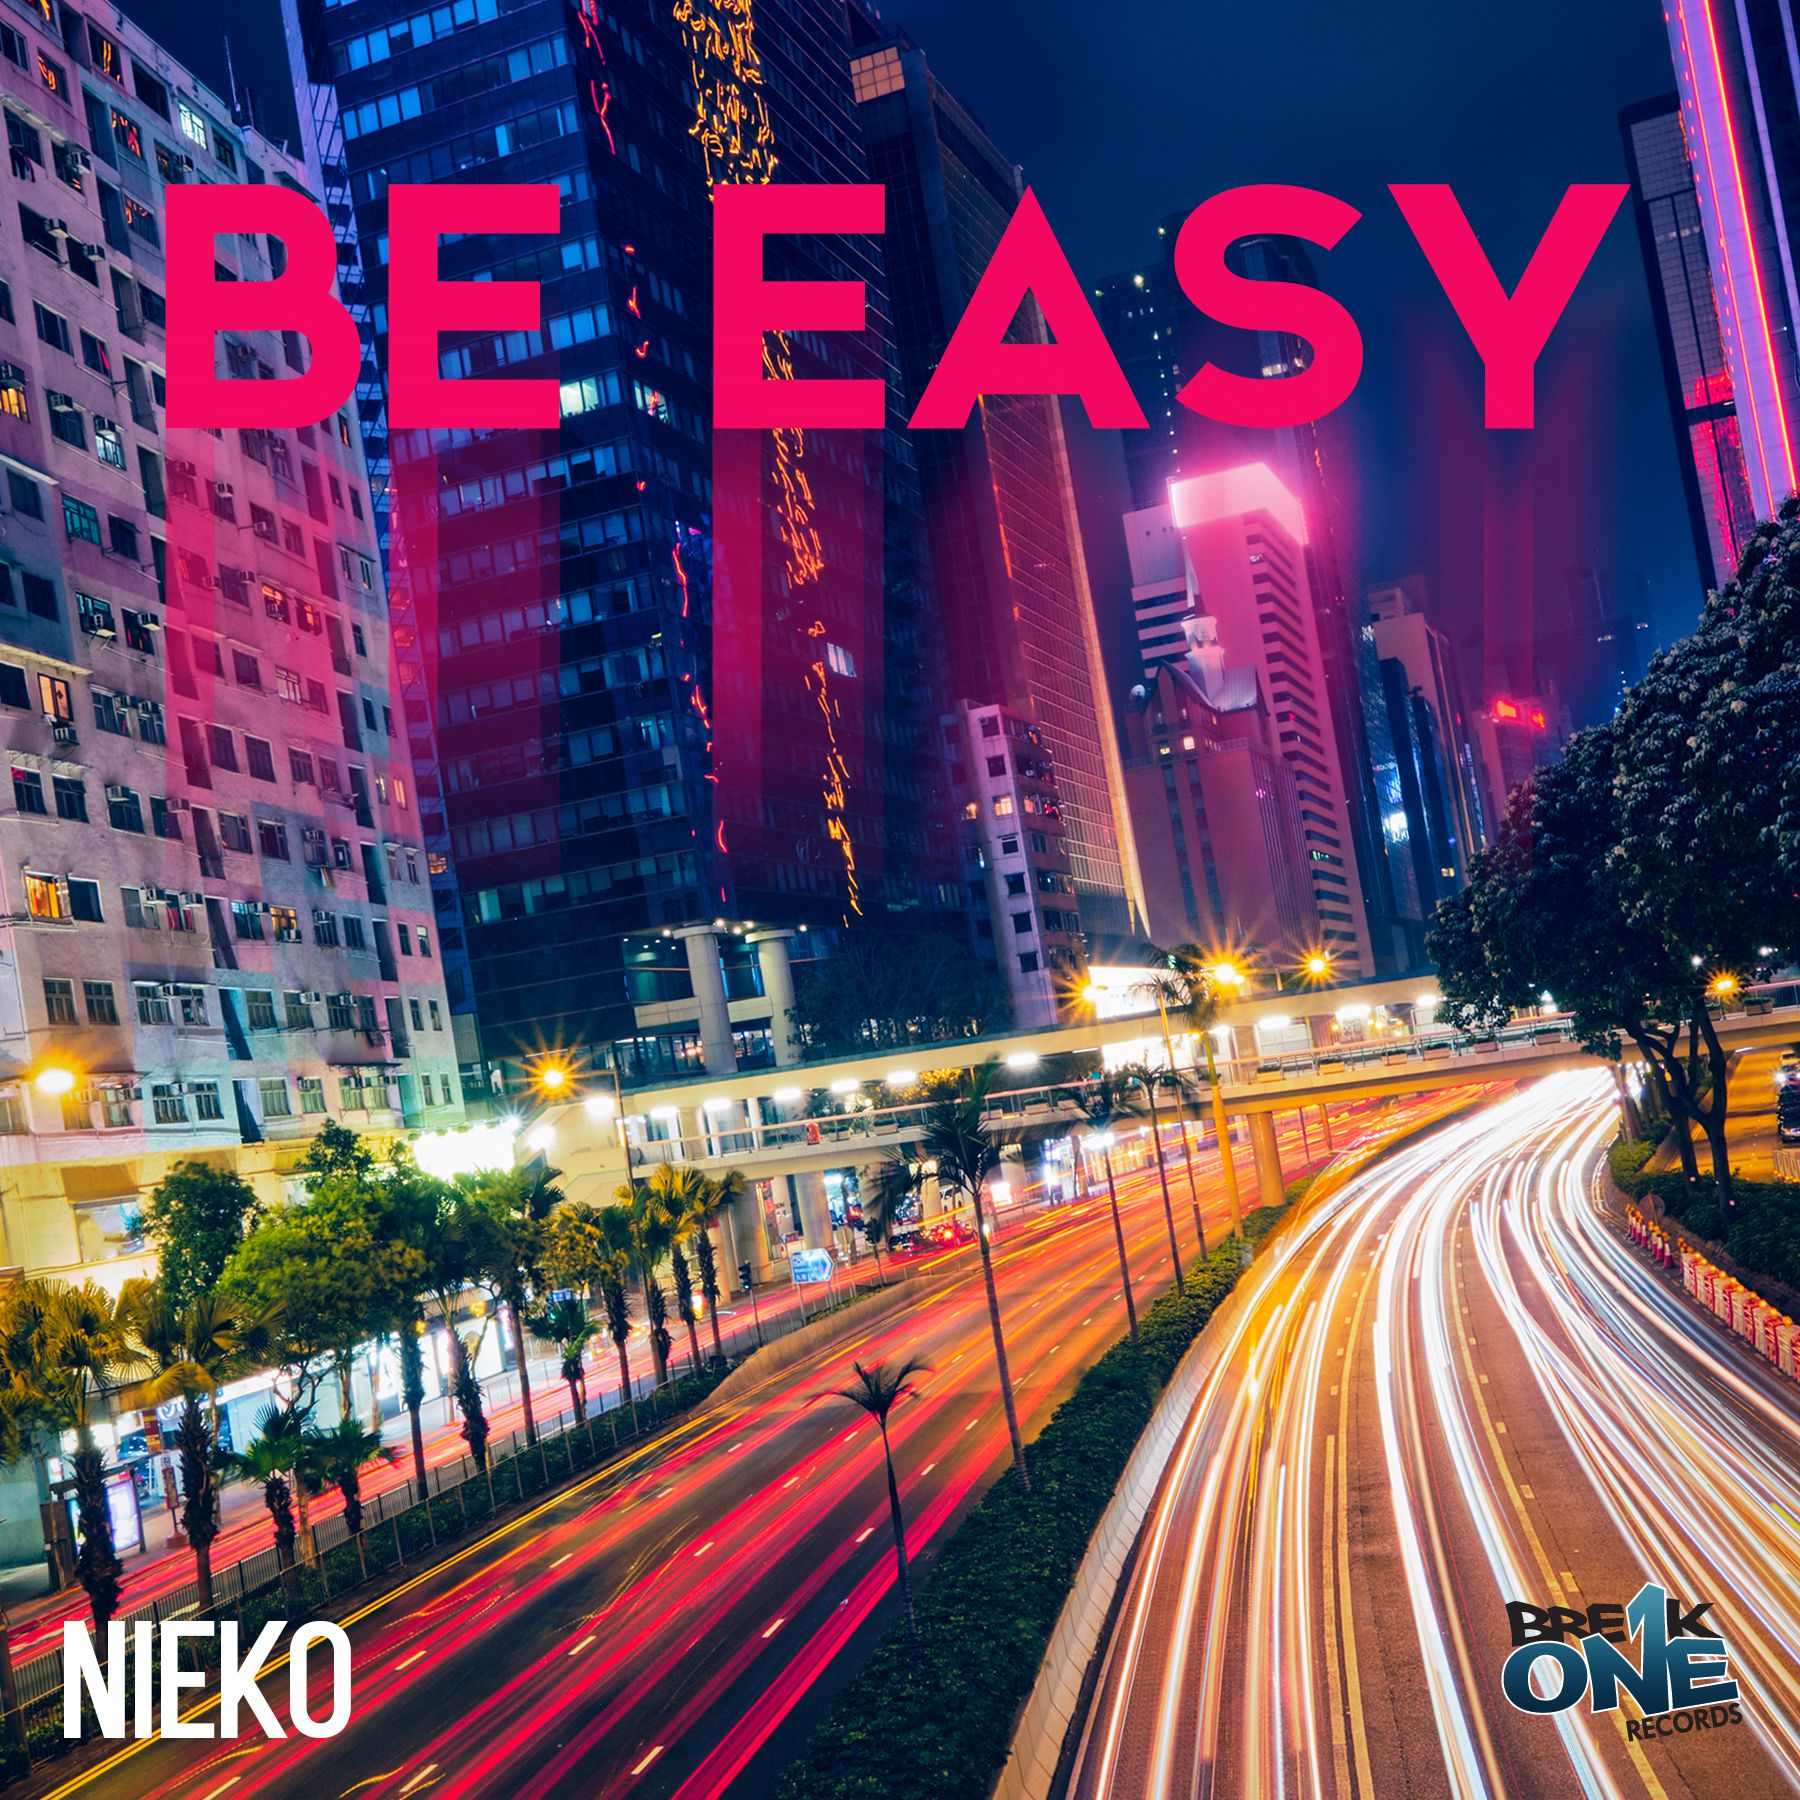 Be Easy Nieko In 2020 Deep House Music Techno Music House Music